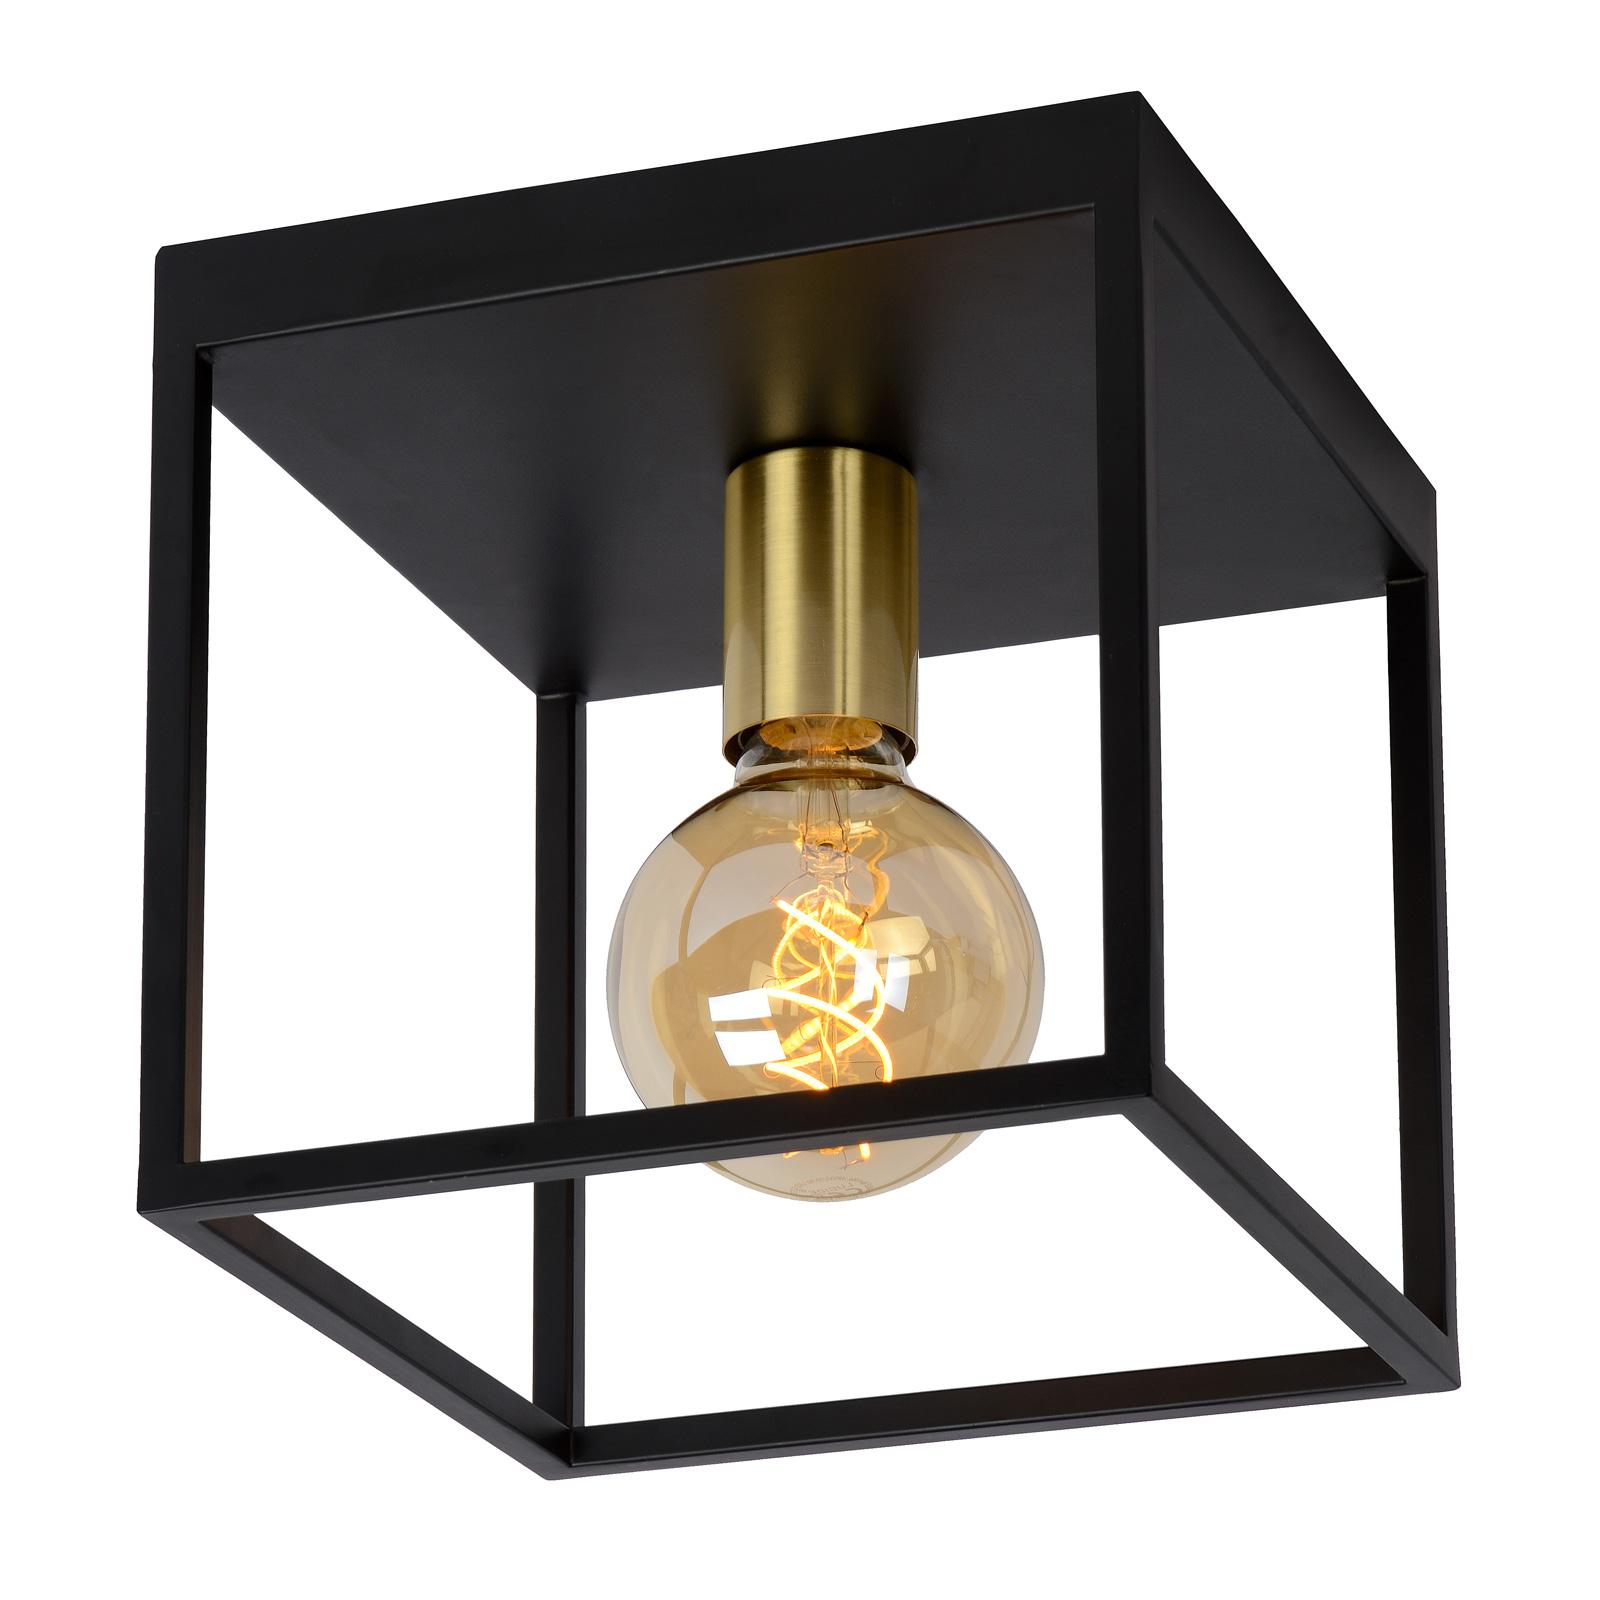 Lampa sufitowa Rube, czarna